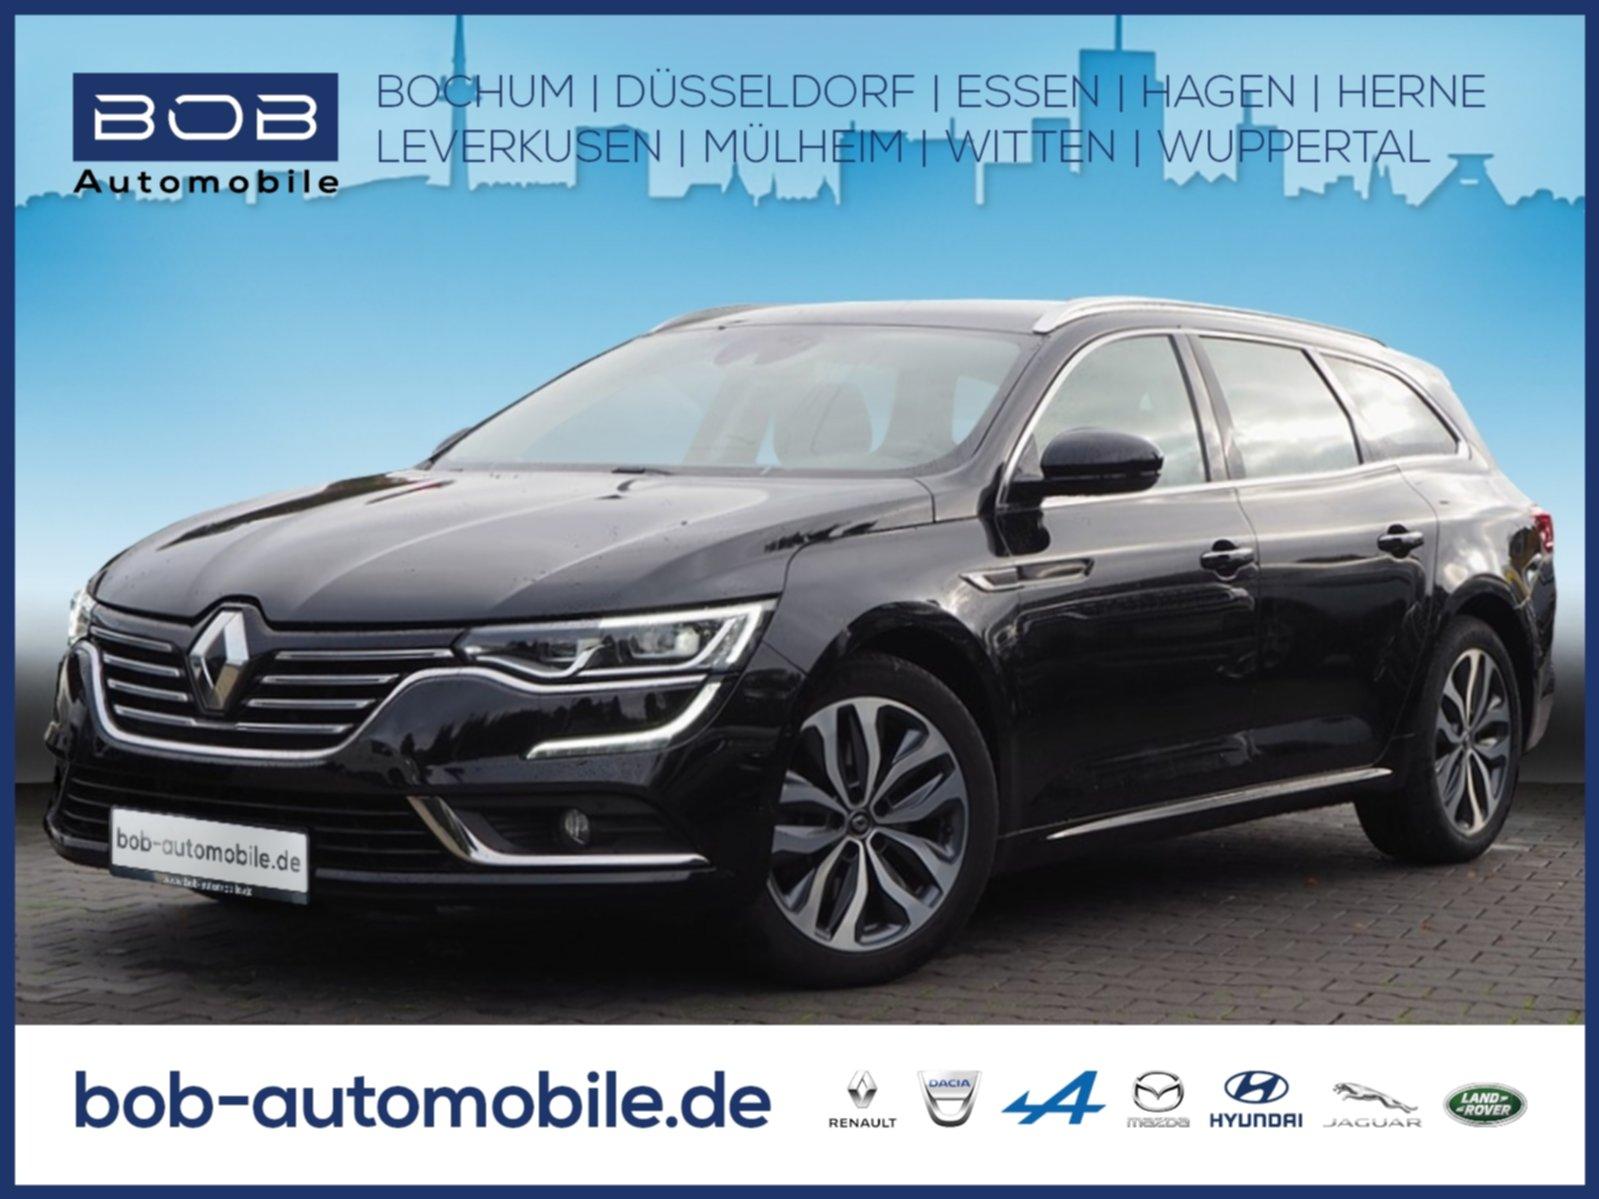 Renault Talisman Grandtour dci160 EDC Intens NAVI LED, Jahr 2016, Diesel